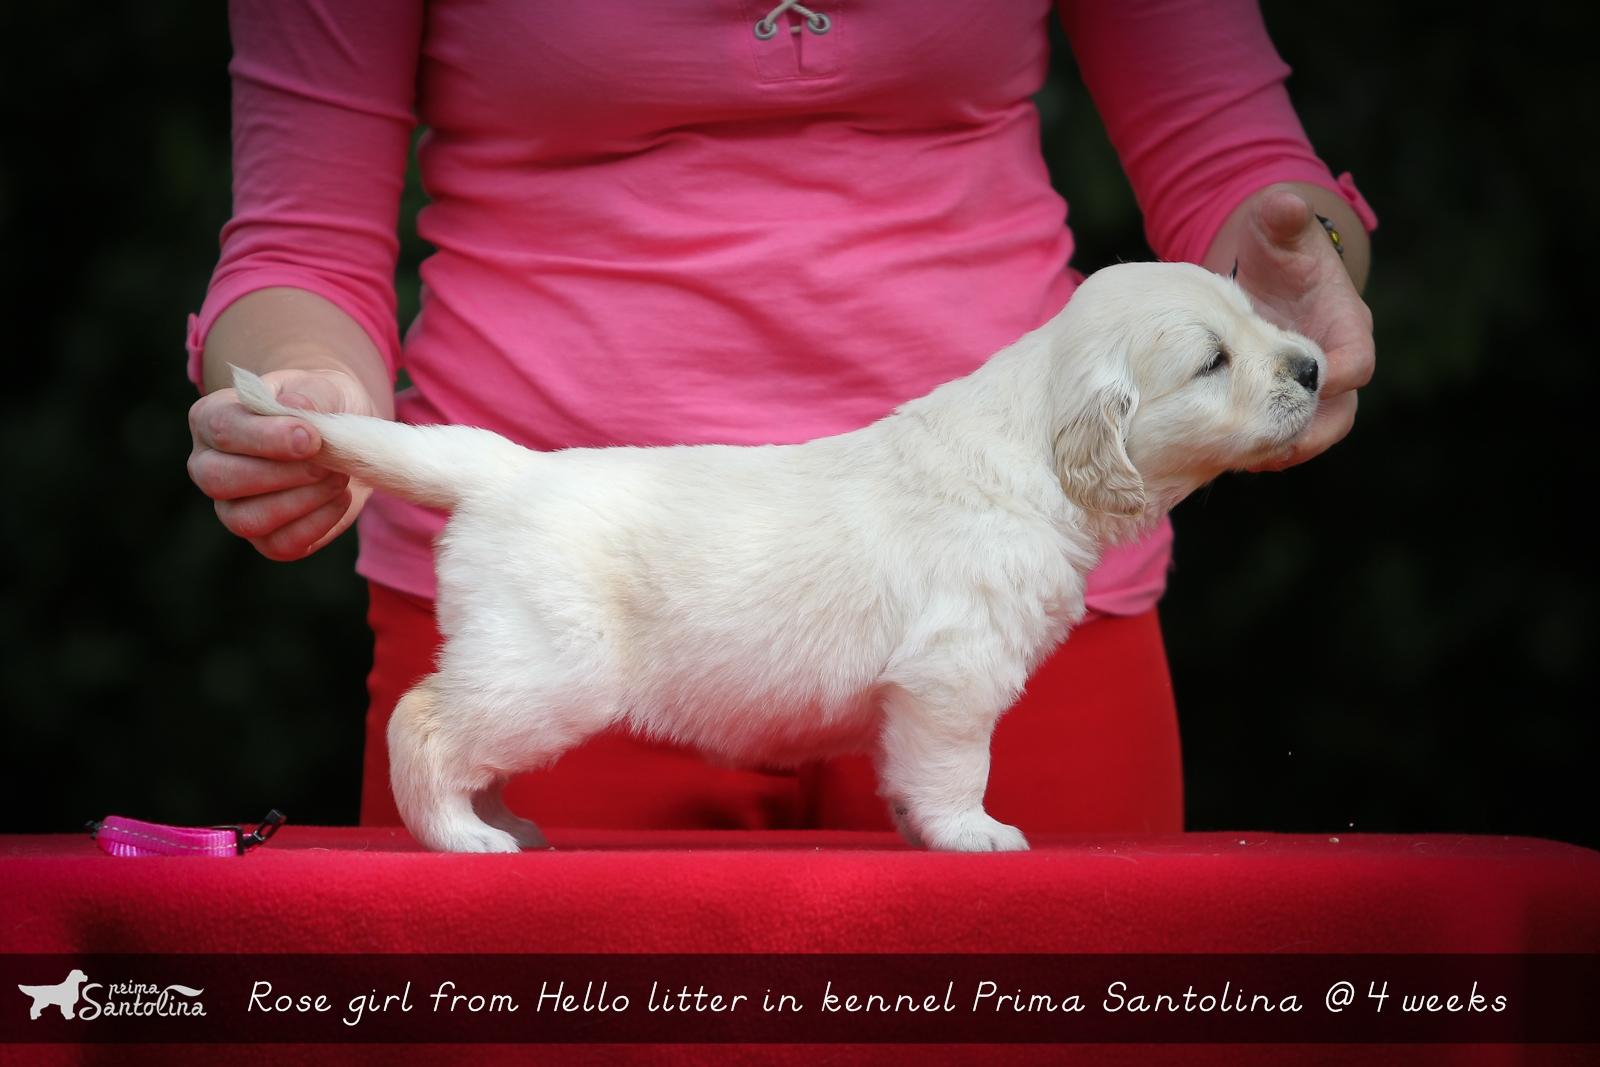 Hello litter in golden retriever kennel Prima Santolina